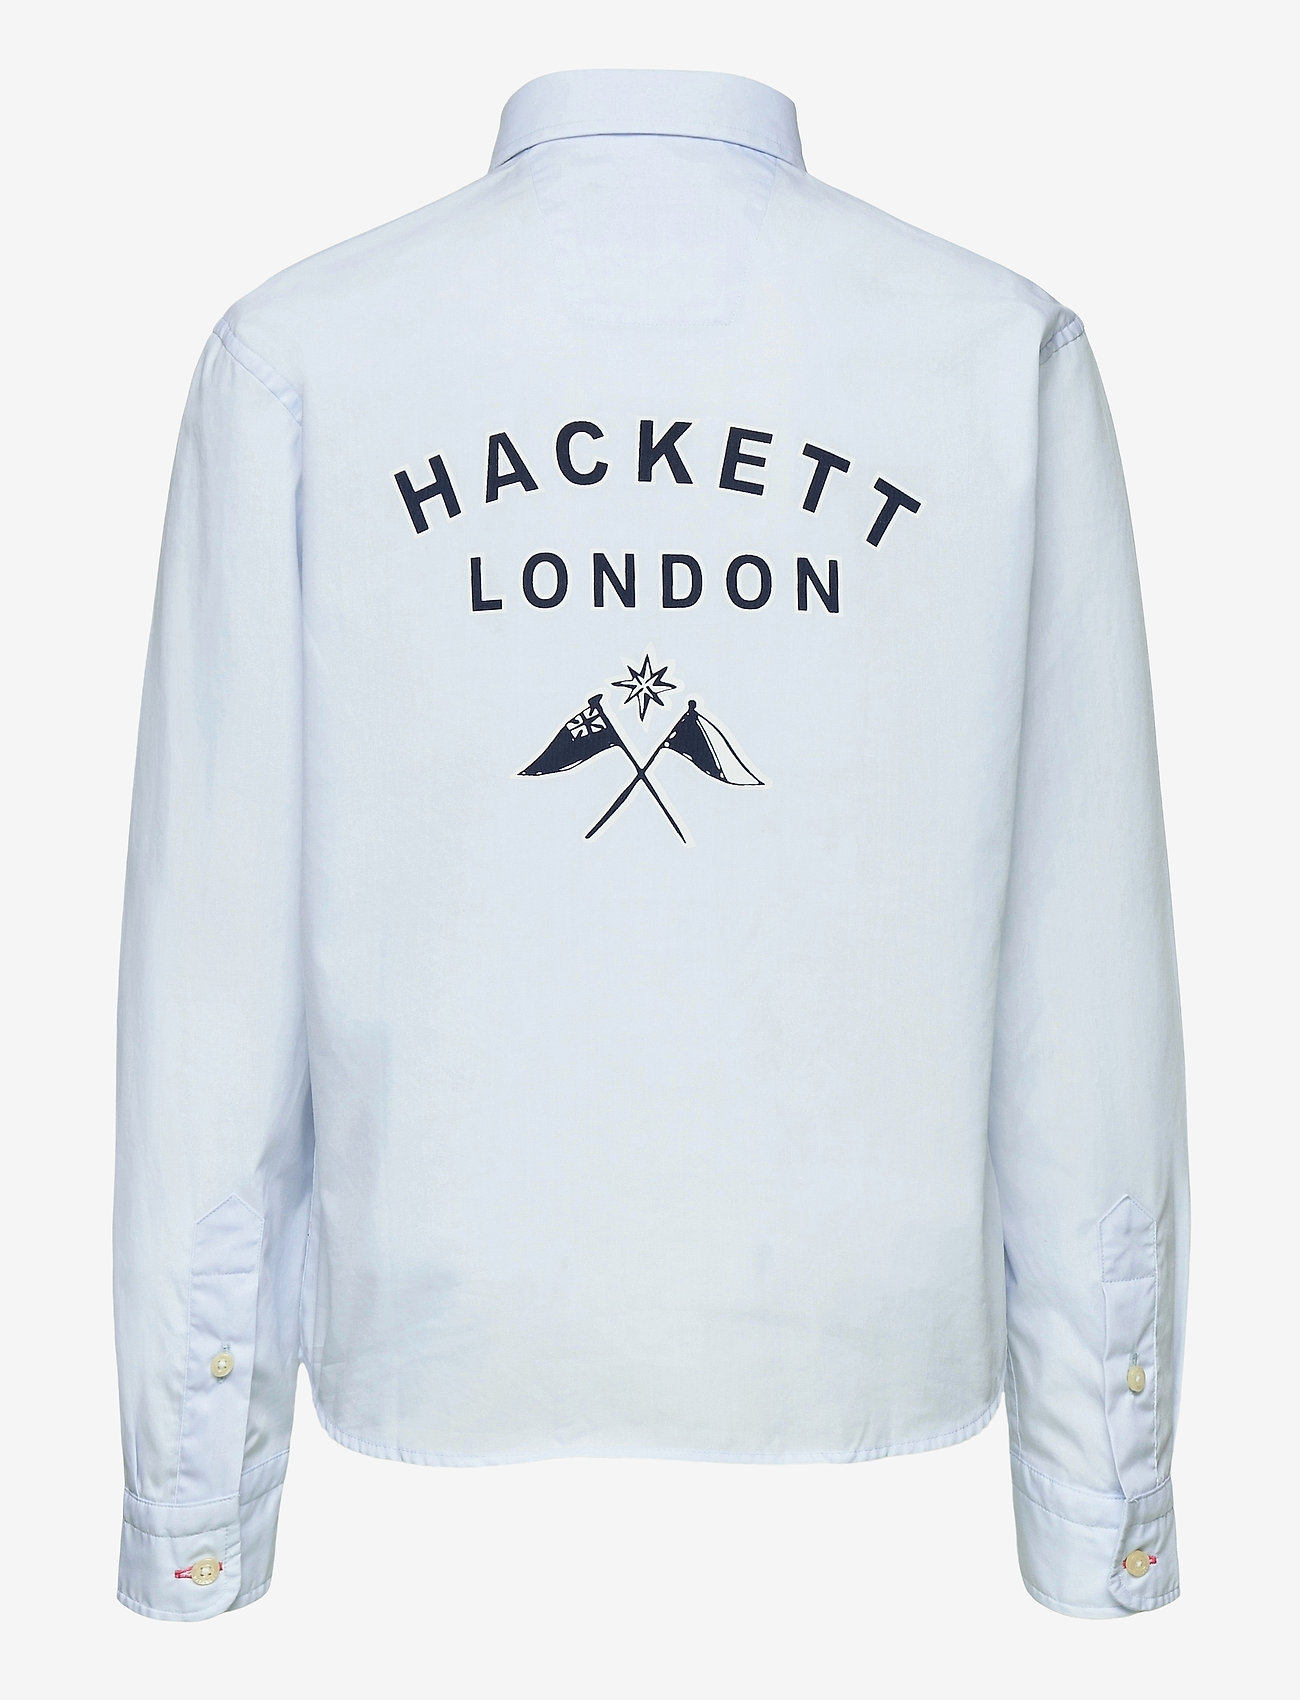 Hackett London - SAIL AND EXPLORE B - overhemden - sky - 1